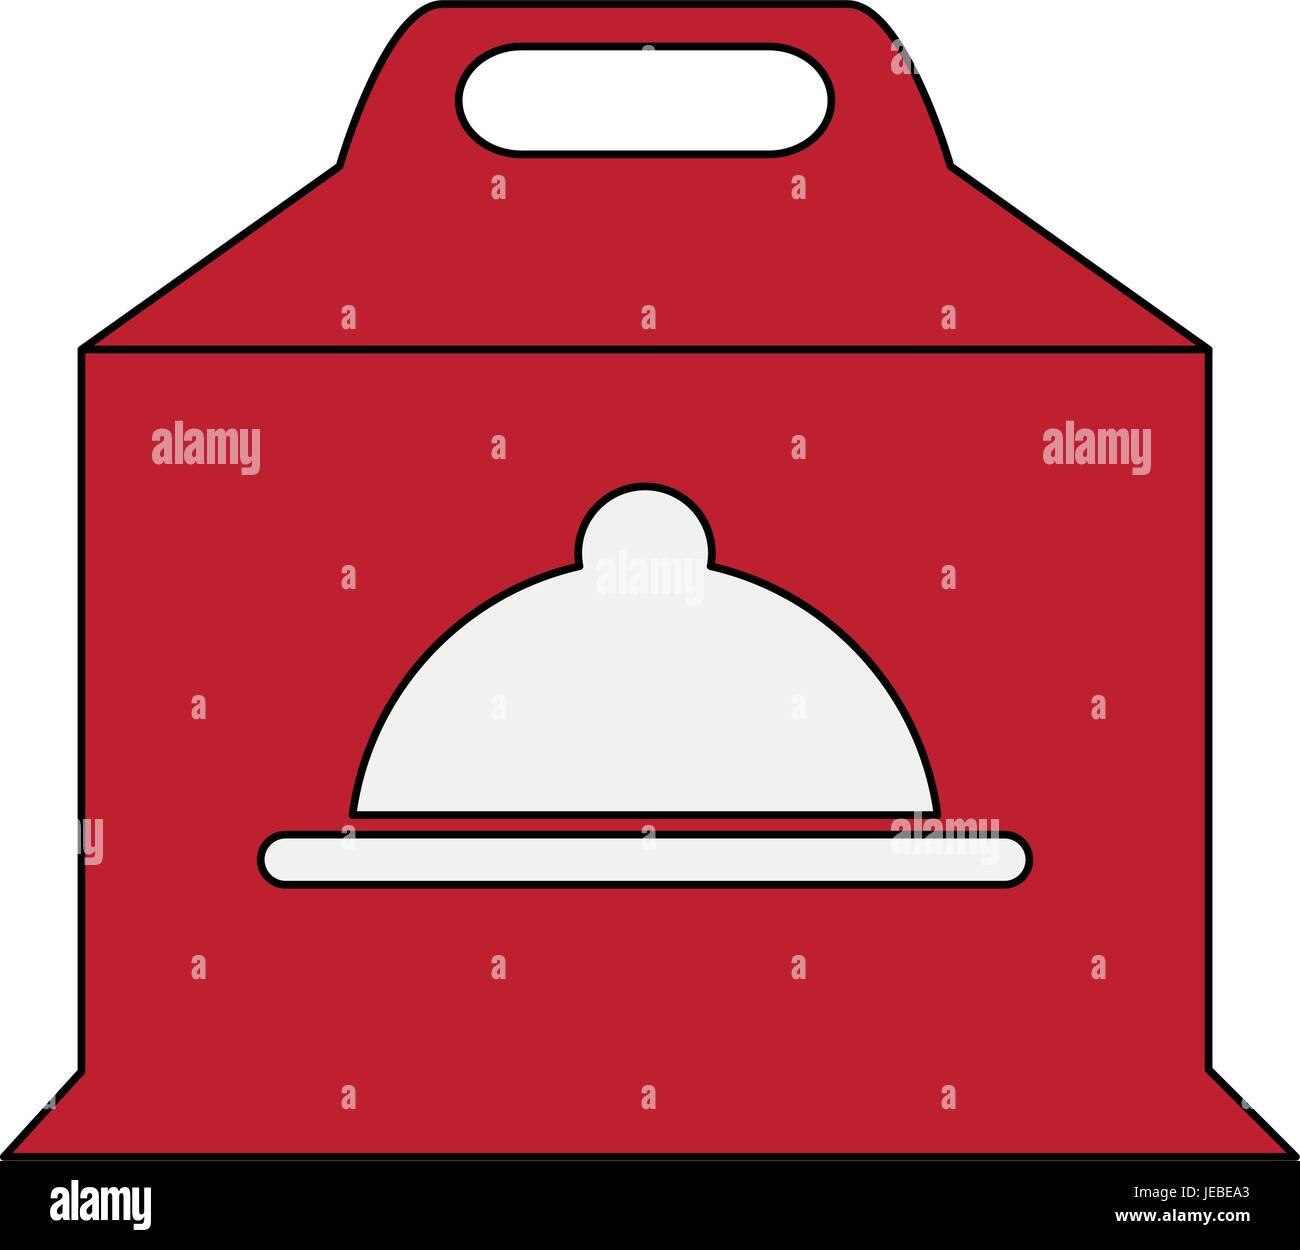 pizza domicile fast food Stock Vector Image & Art - Alamy